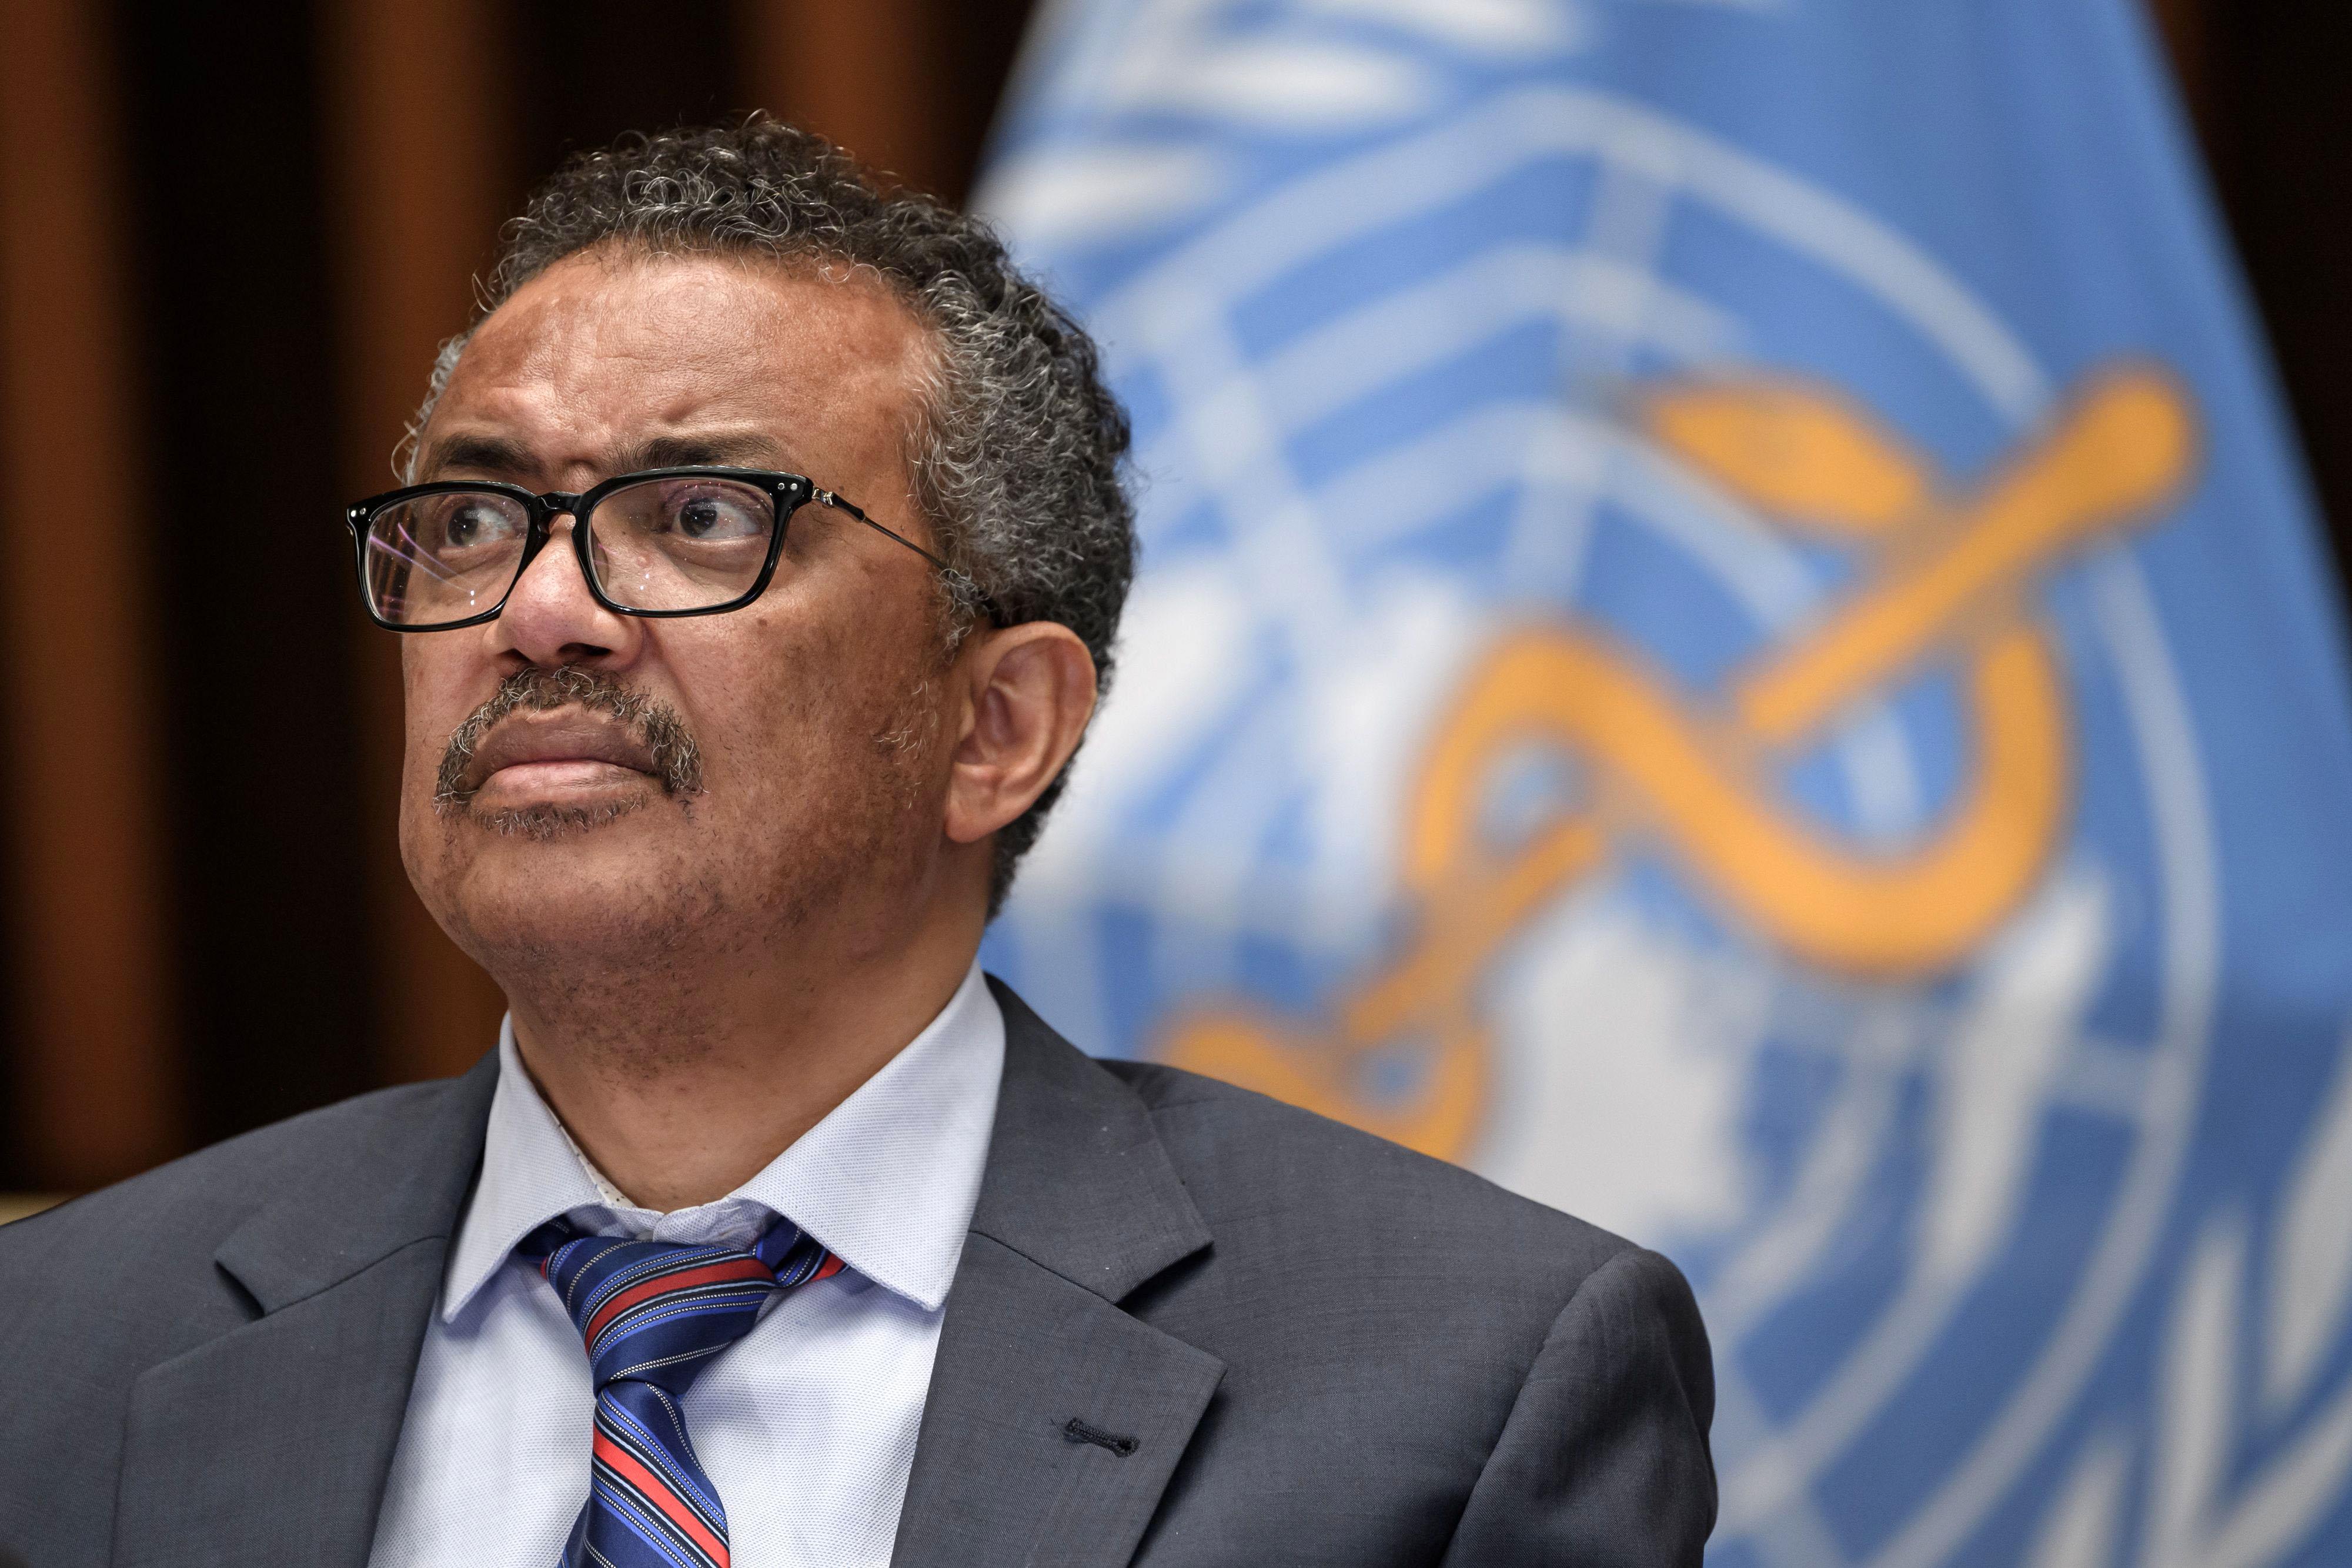 Tedros Adhanom Ghebreyesus, director-general of the World Health Organization, attends a press conference on July 3 in Geneva, Switzerland.